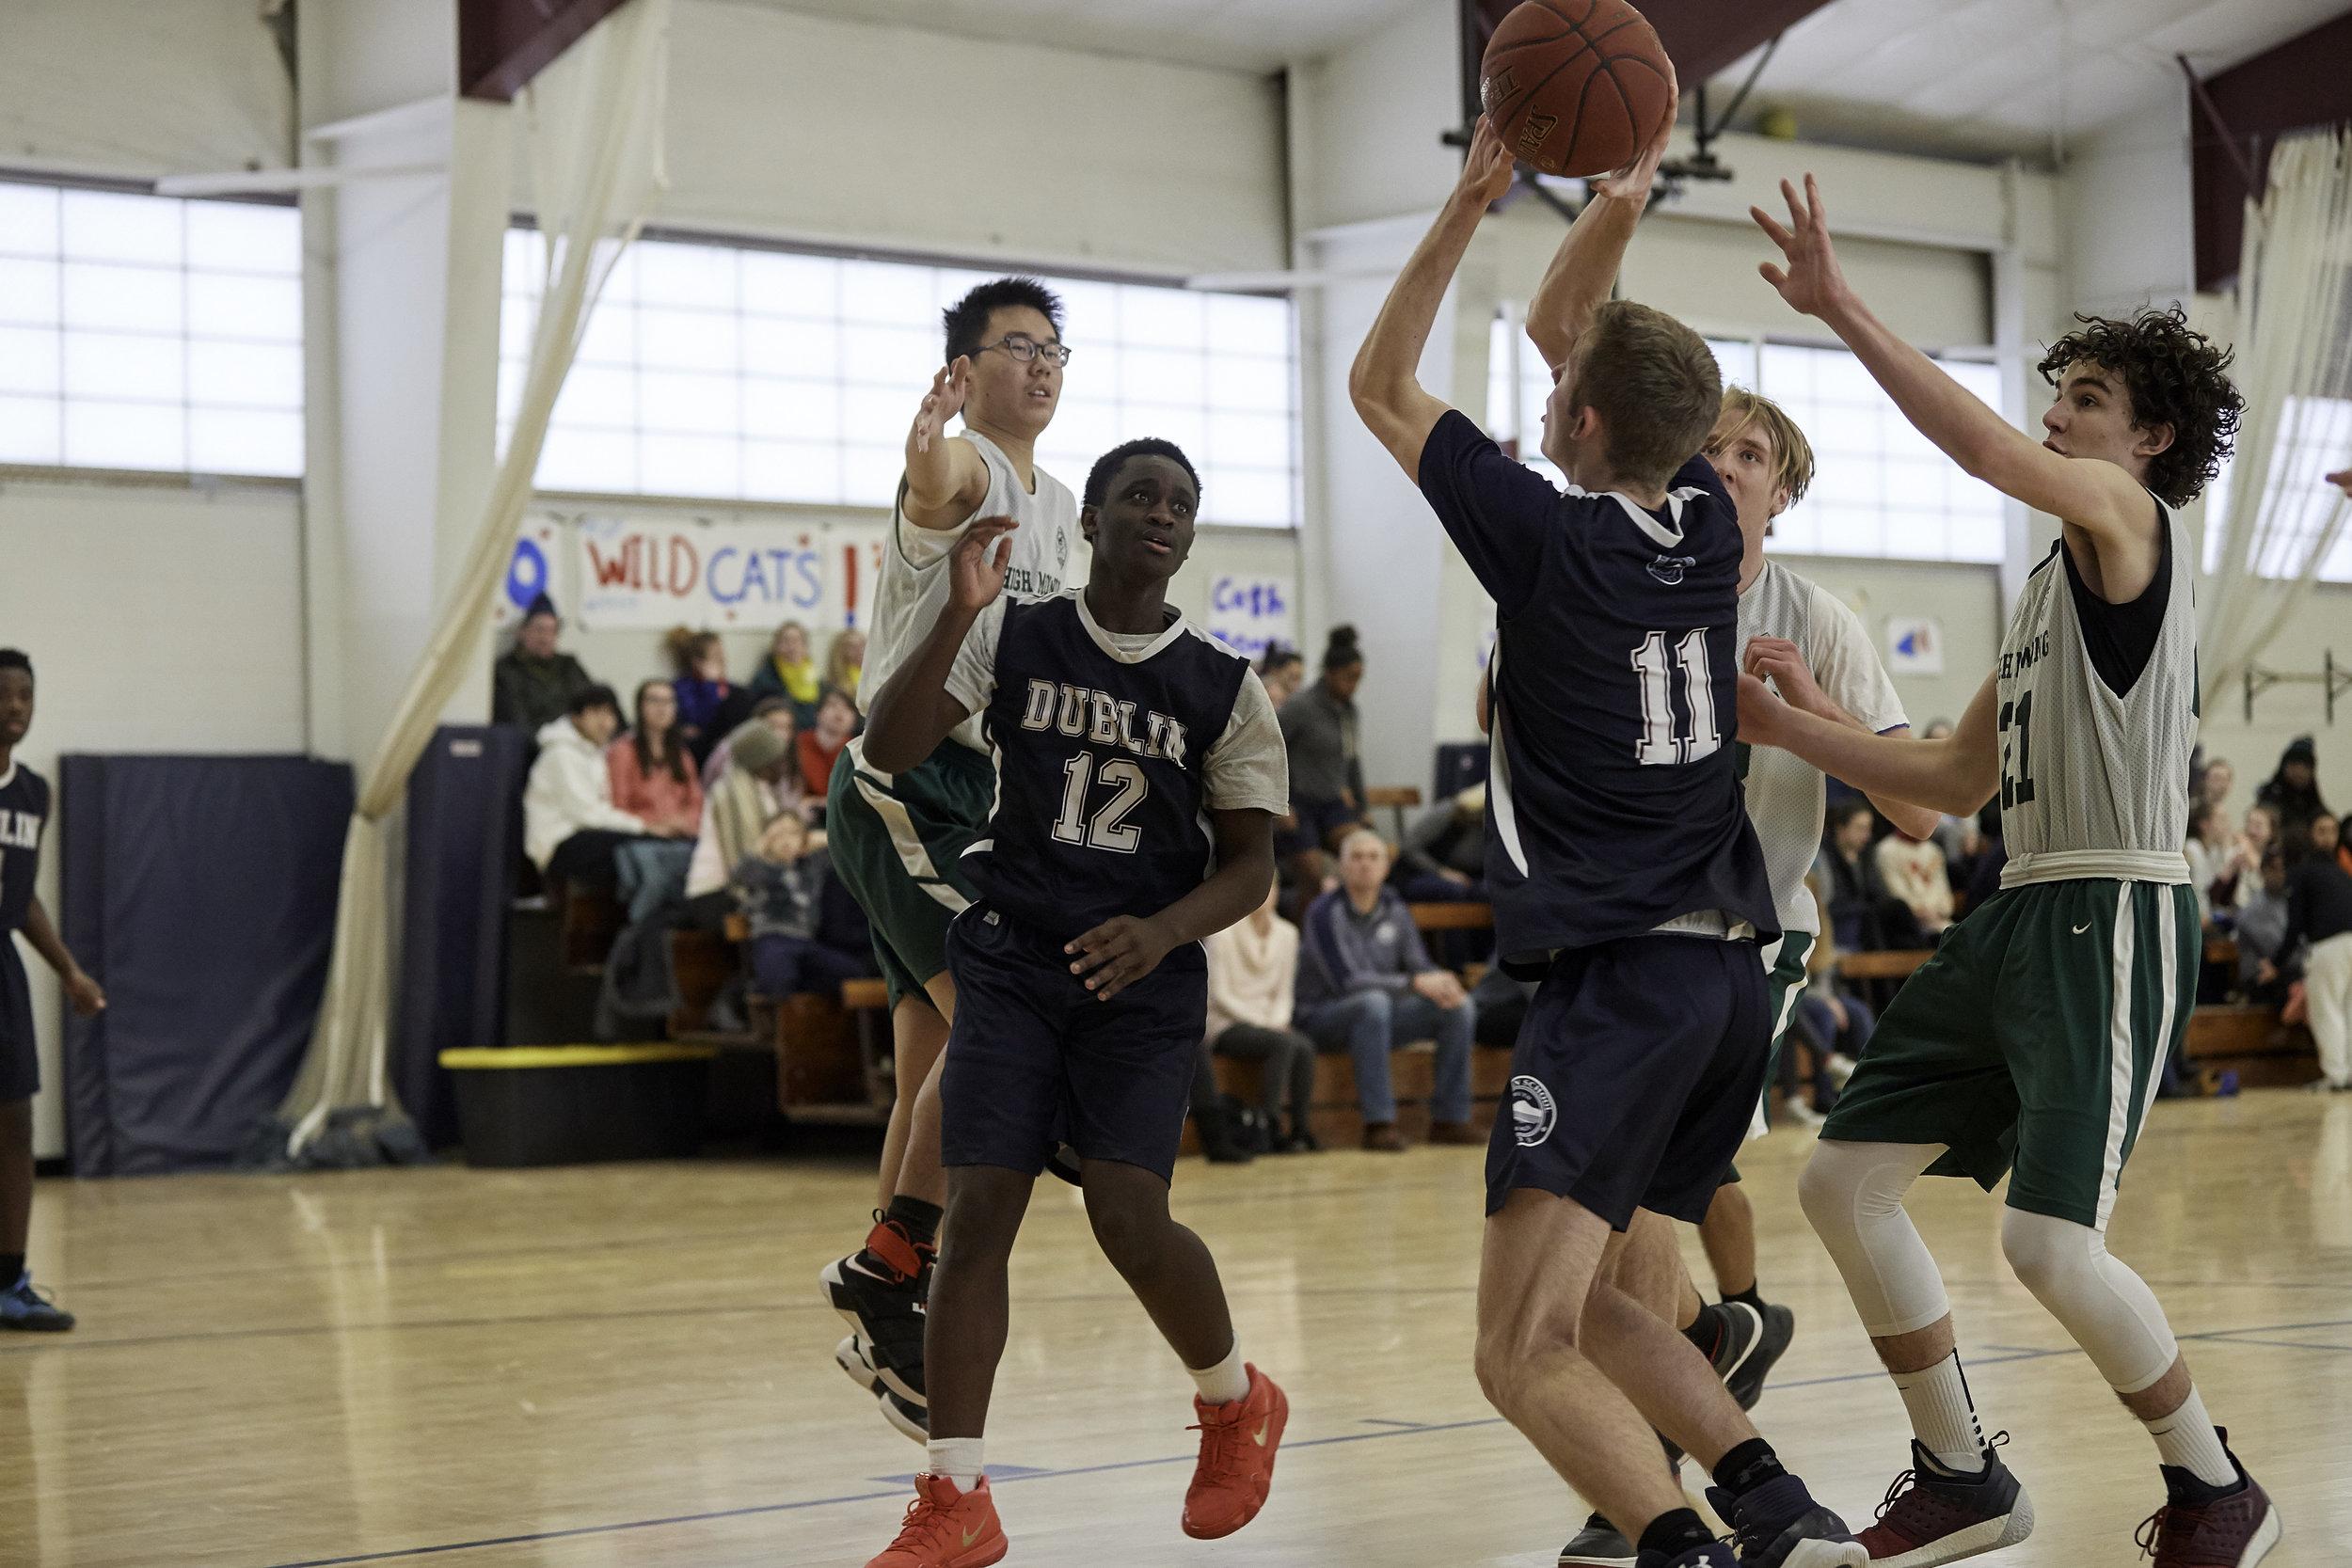 Boys Varsity Basketball vs High Mowing School - Feb 02 2019 - 0076.jpg